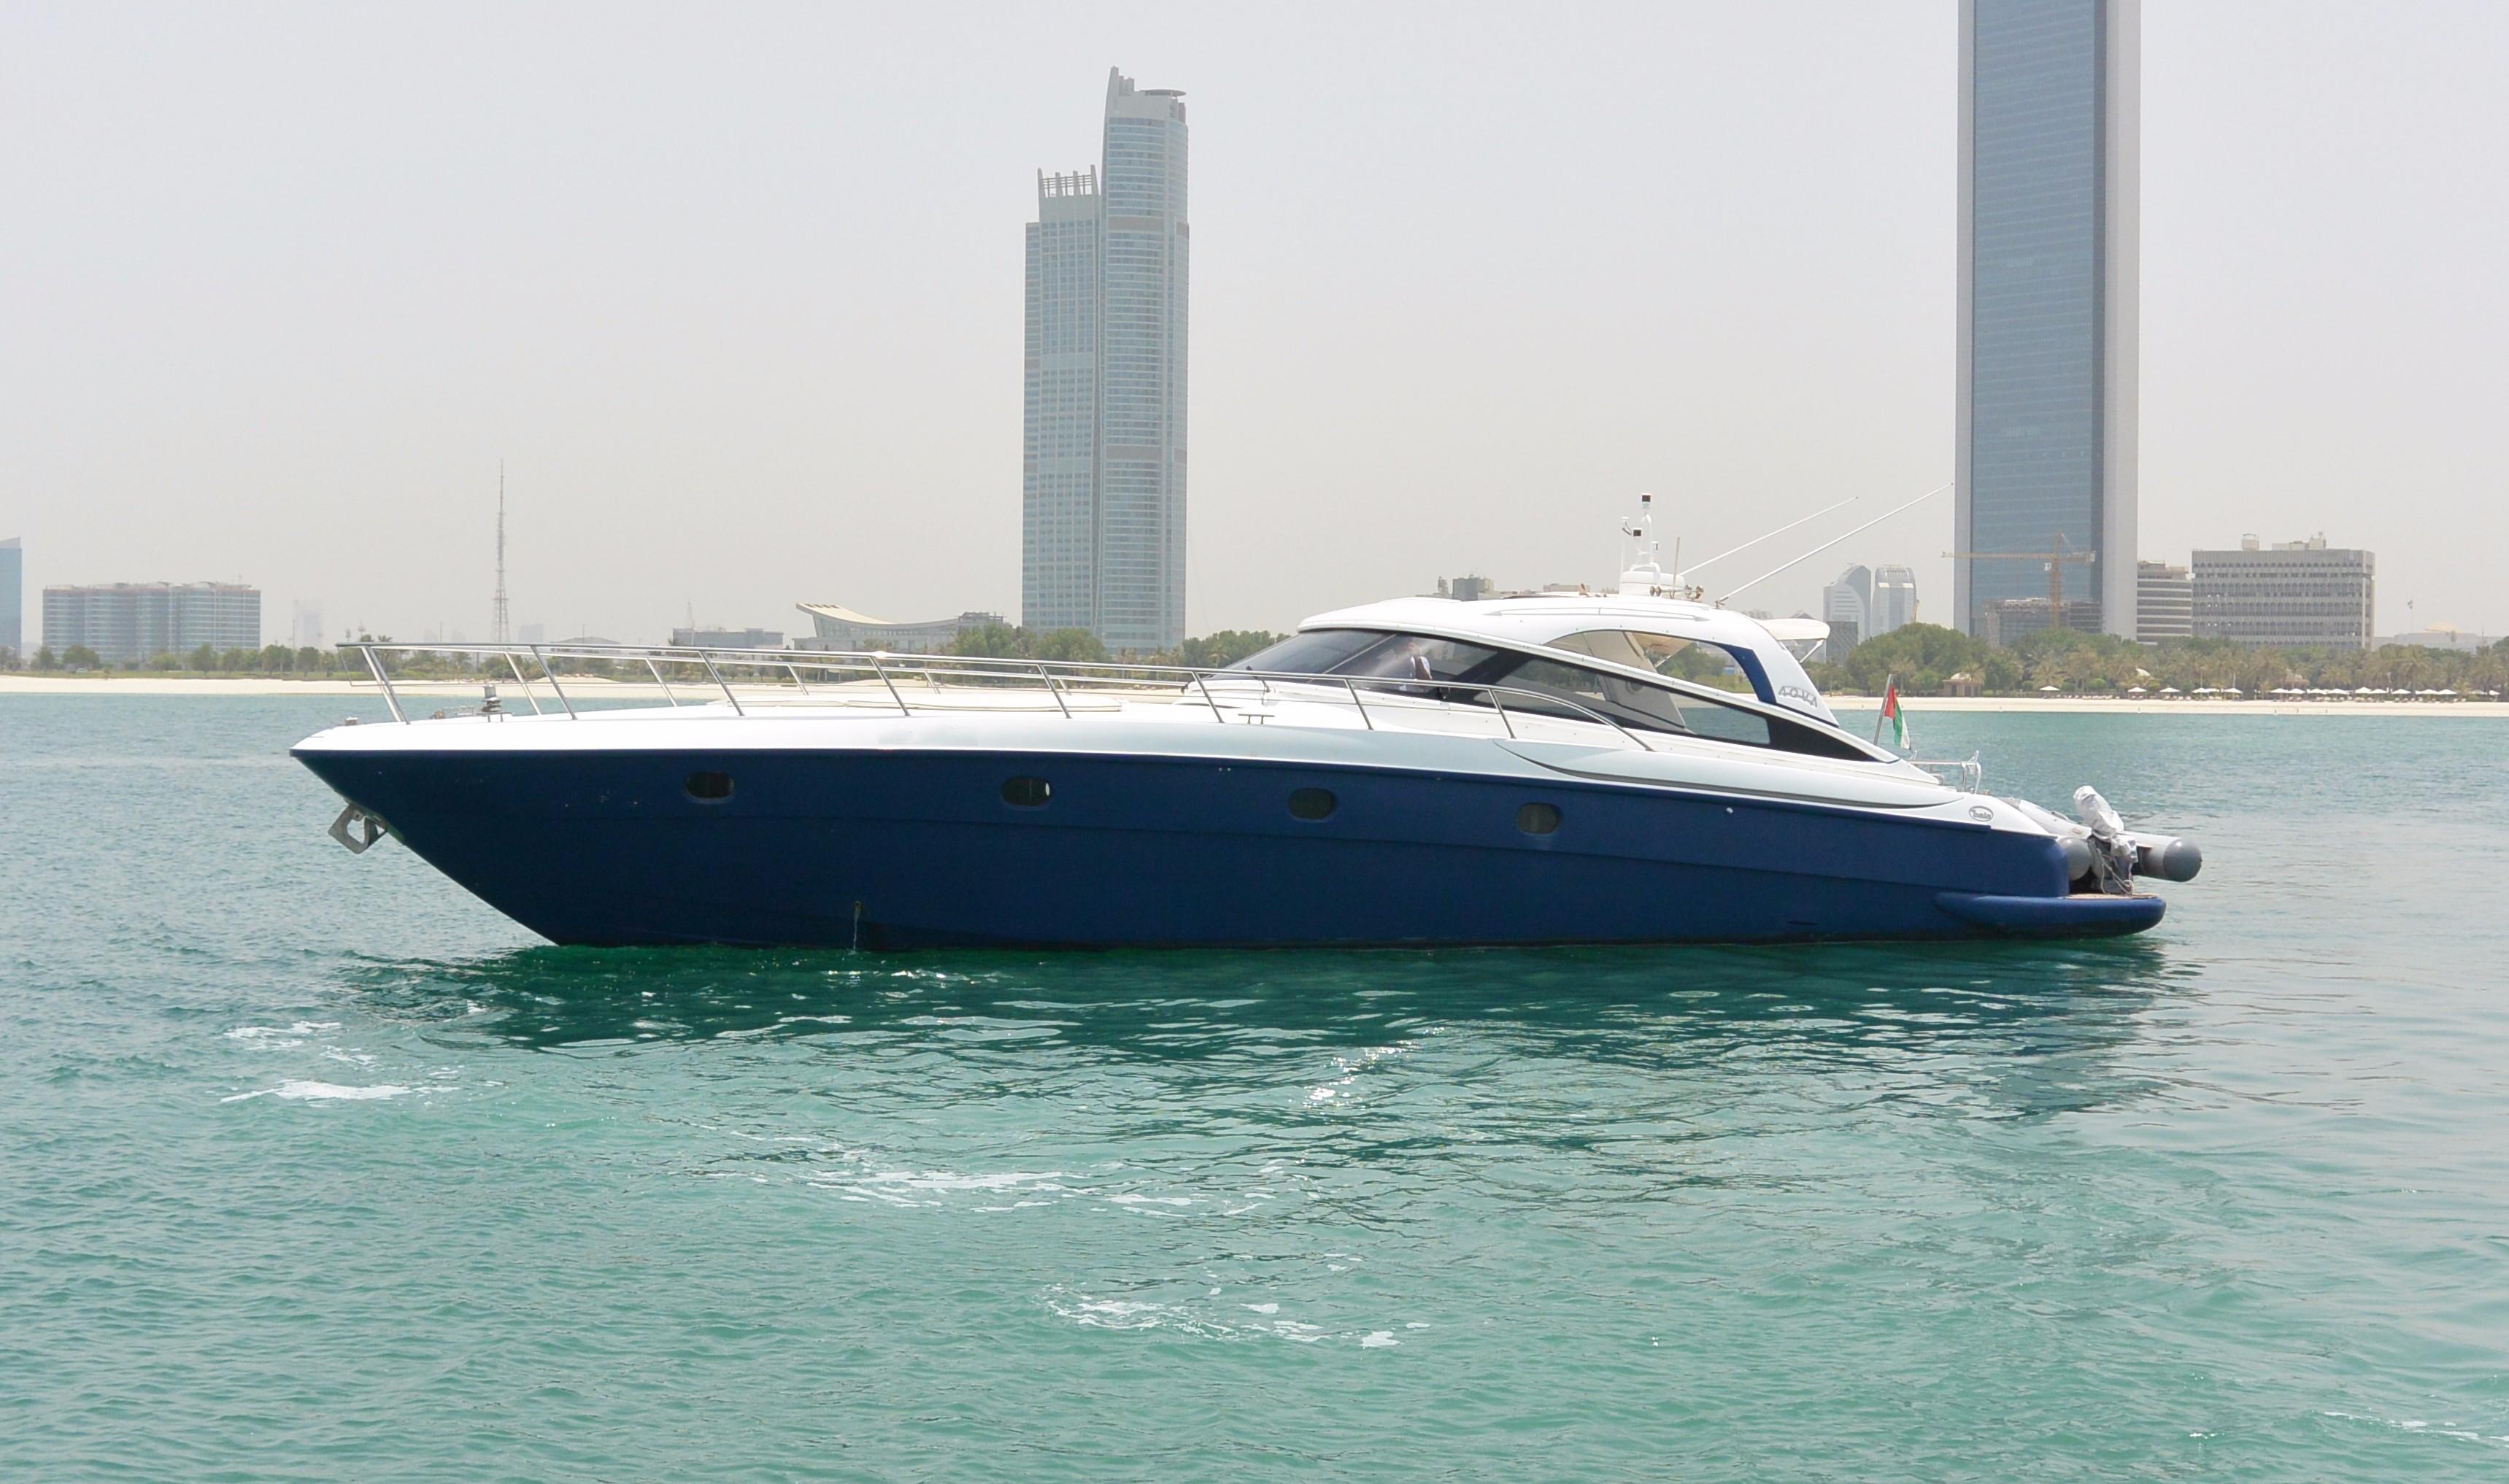 baia aqua 54 motor yacht for sale in united arab emirates for 313 200 241 201